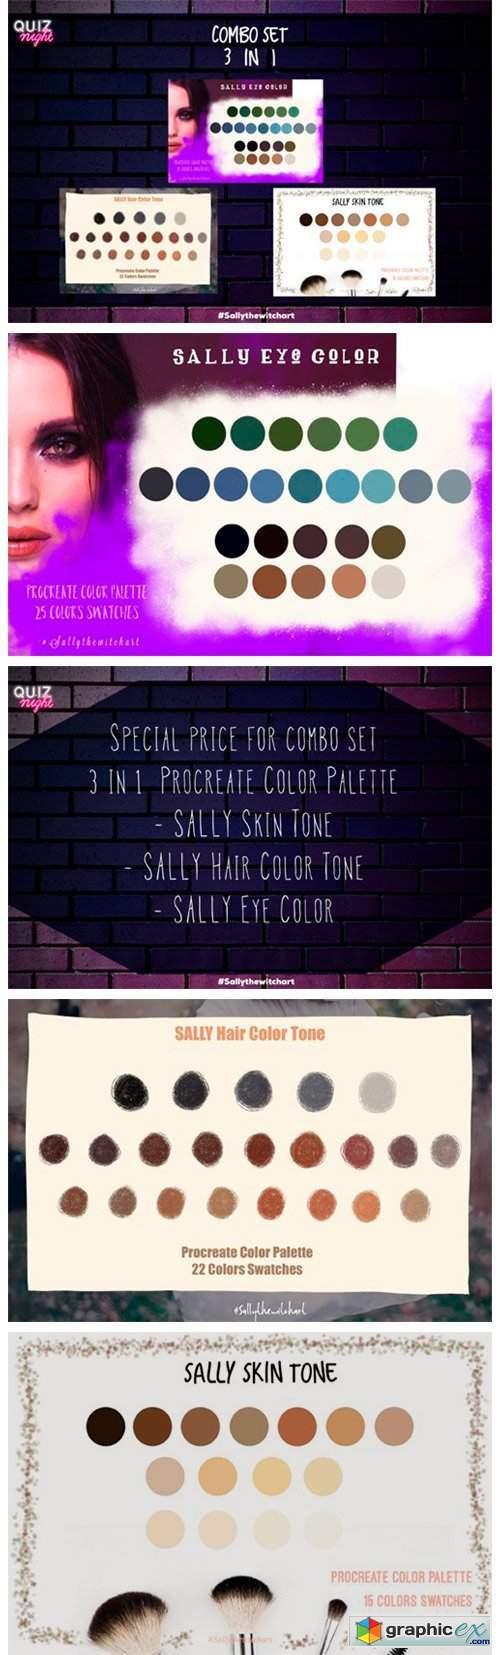 Procreate Color Palette 3 in 1 Combo Set